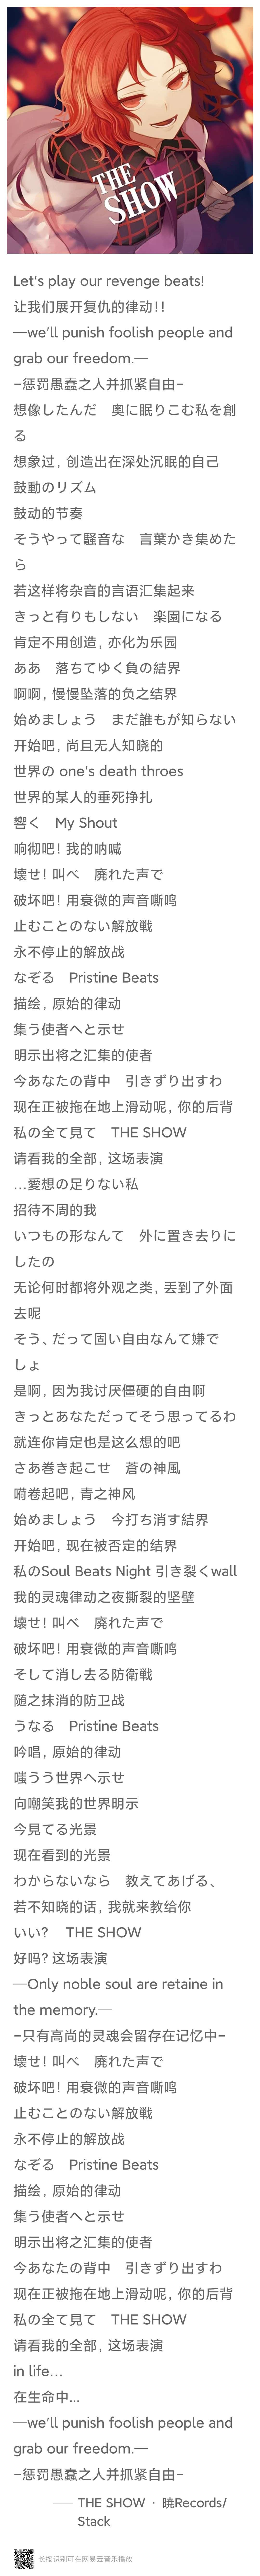 【音乐】THE SHOW-小柚妹站